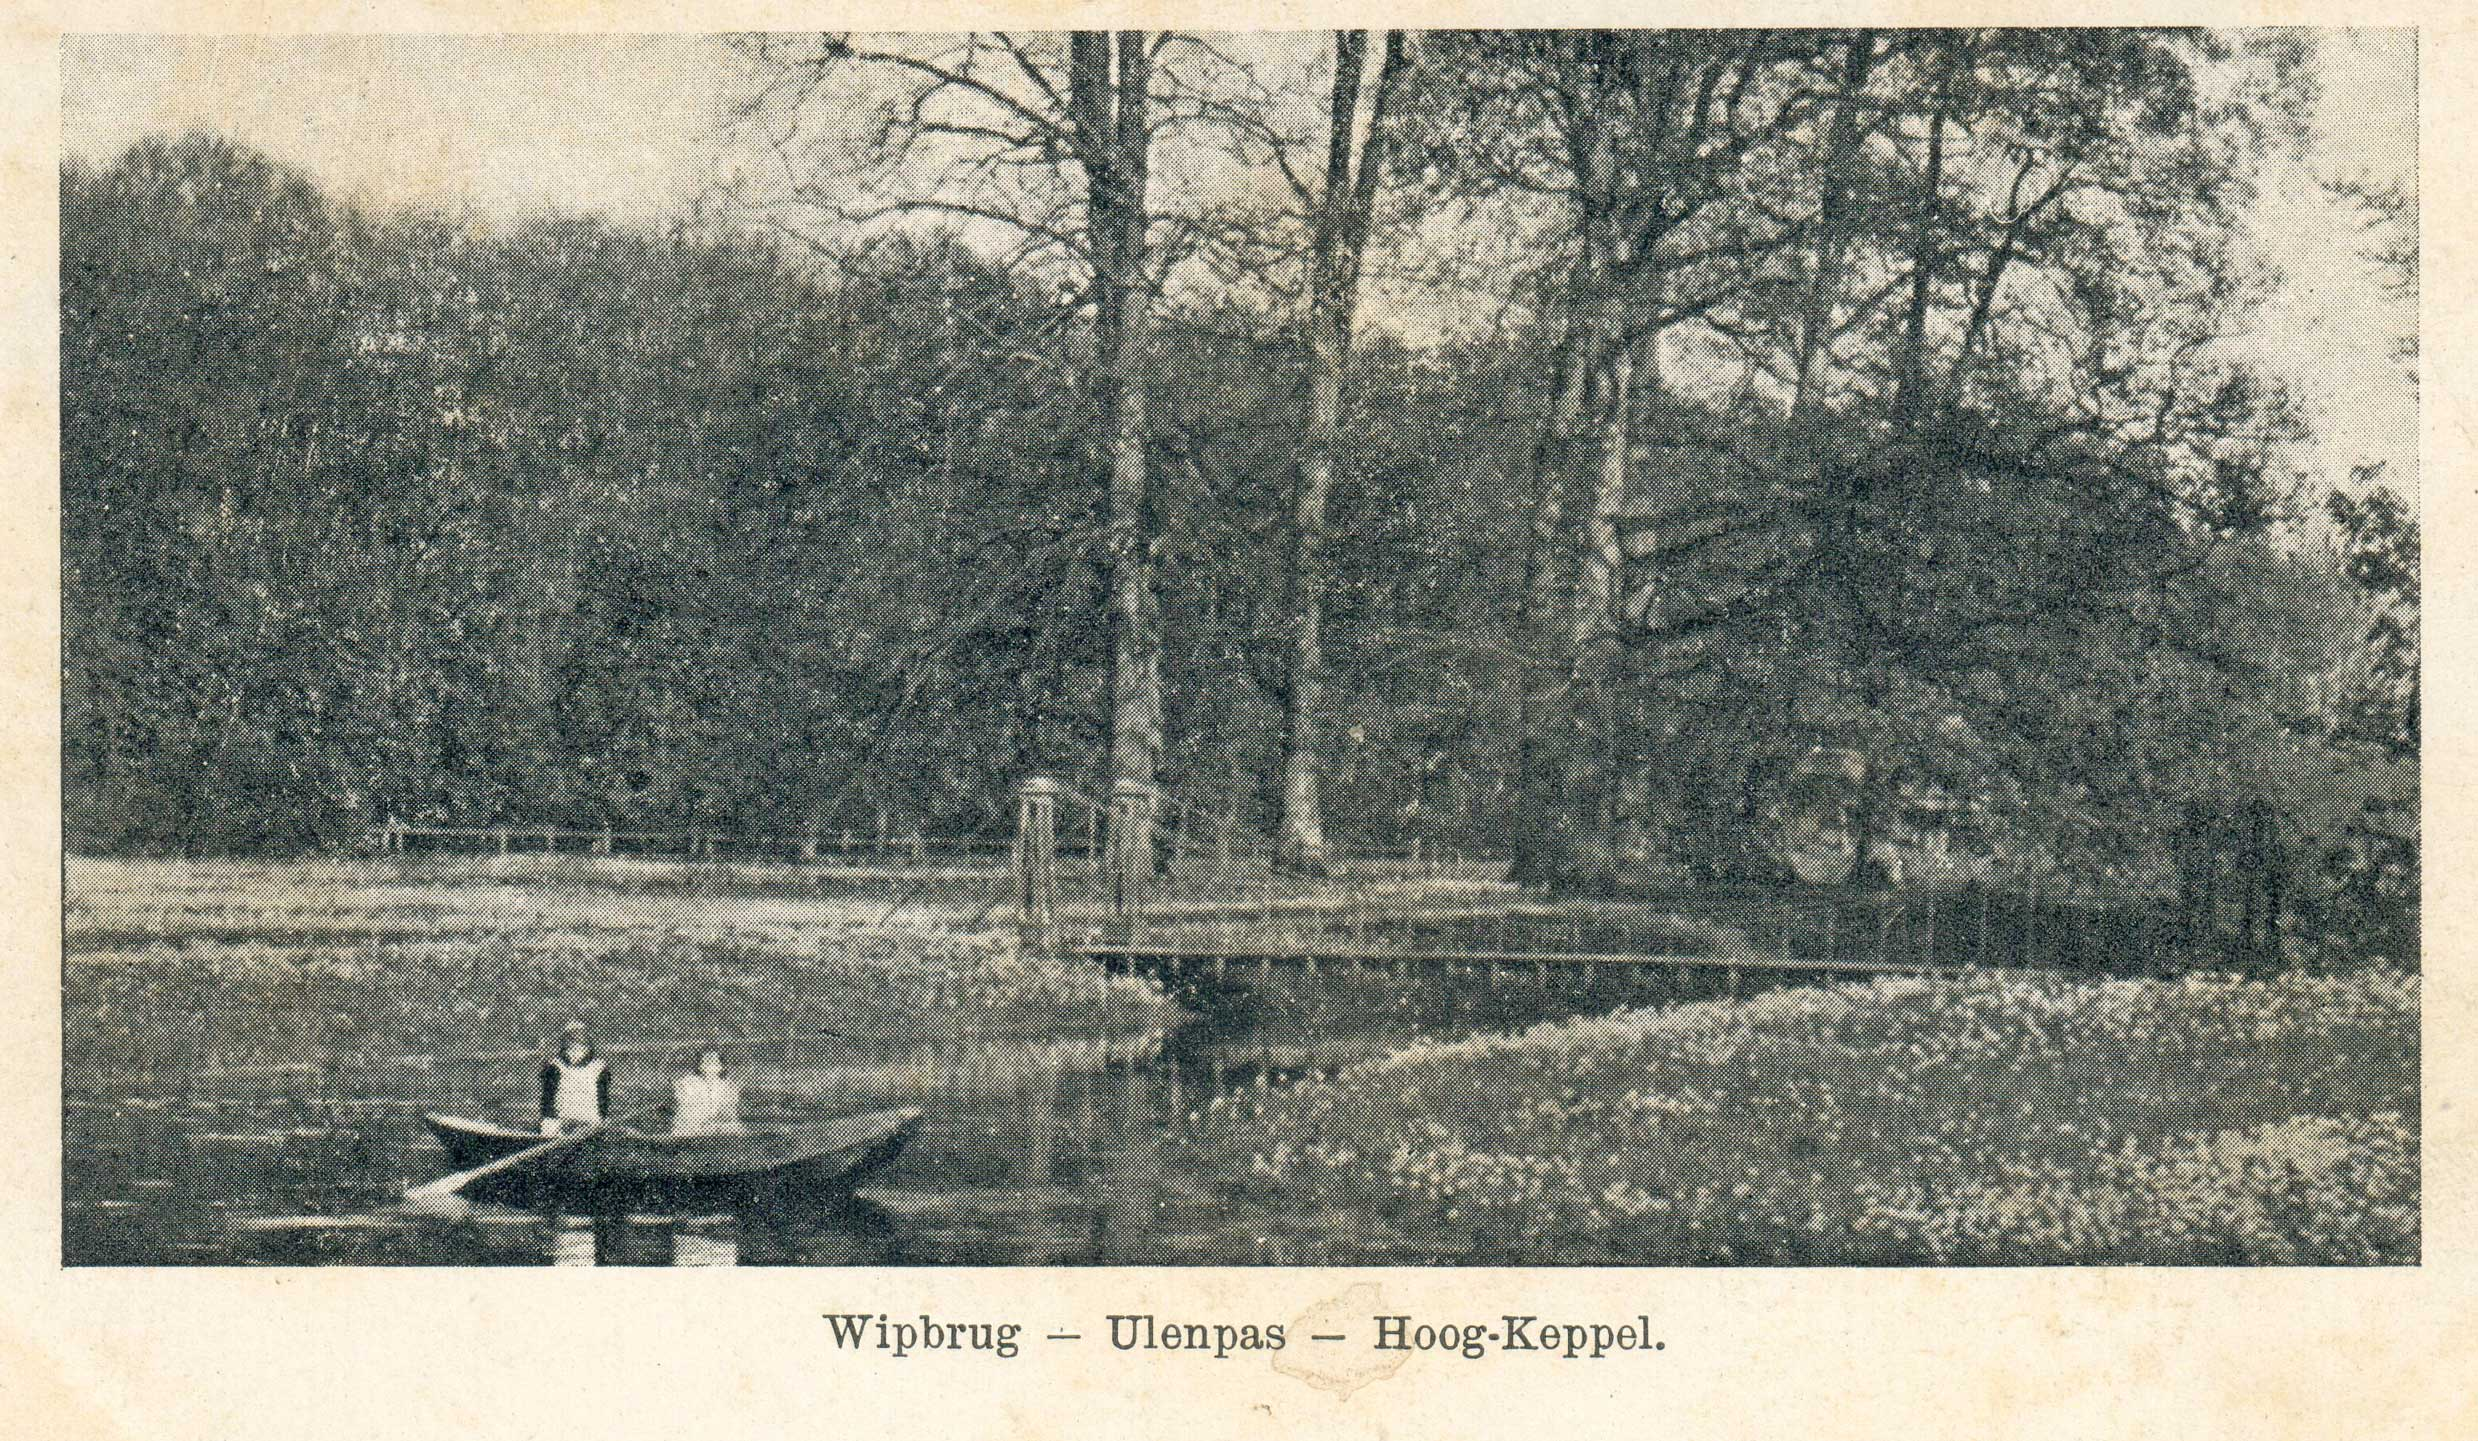 Hoog-Keppel Dubbeltjesweg 20 Hangbrug bij Ulenpas